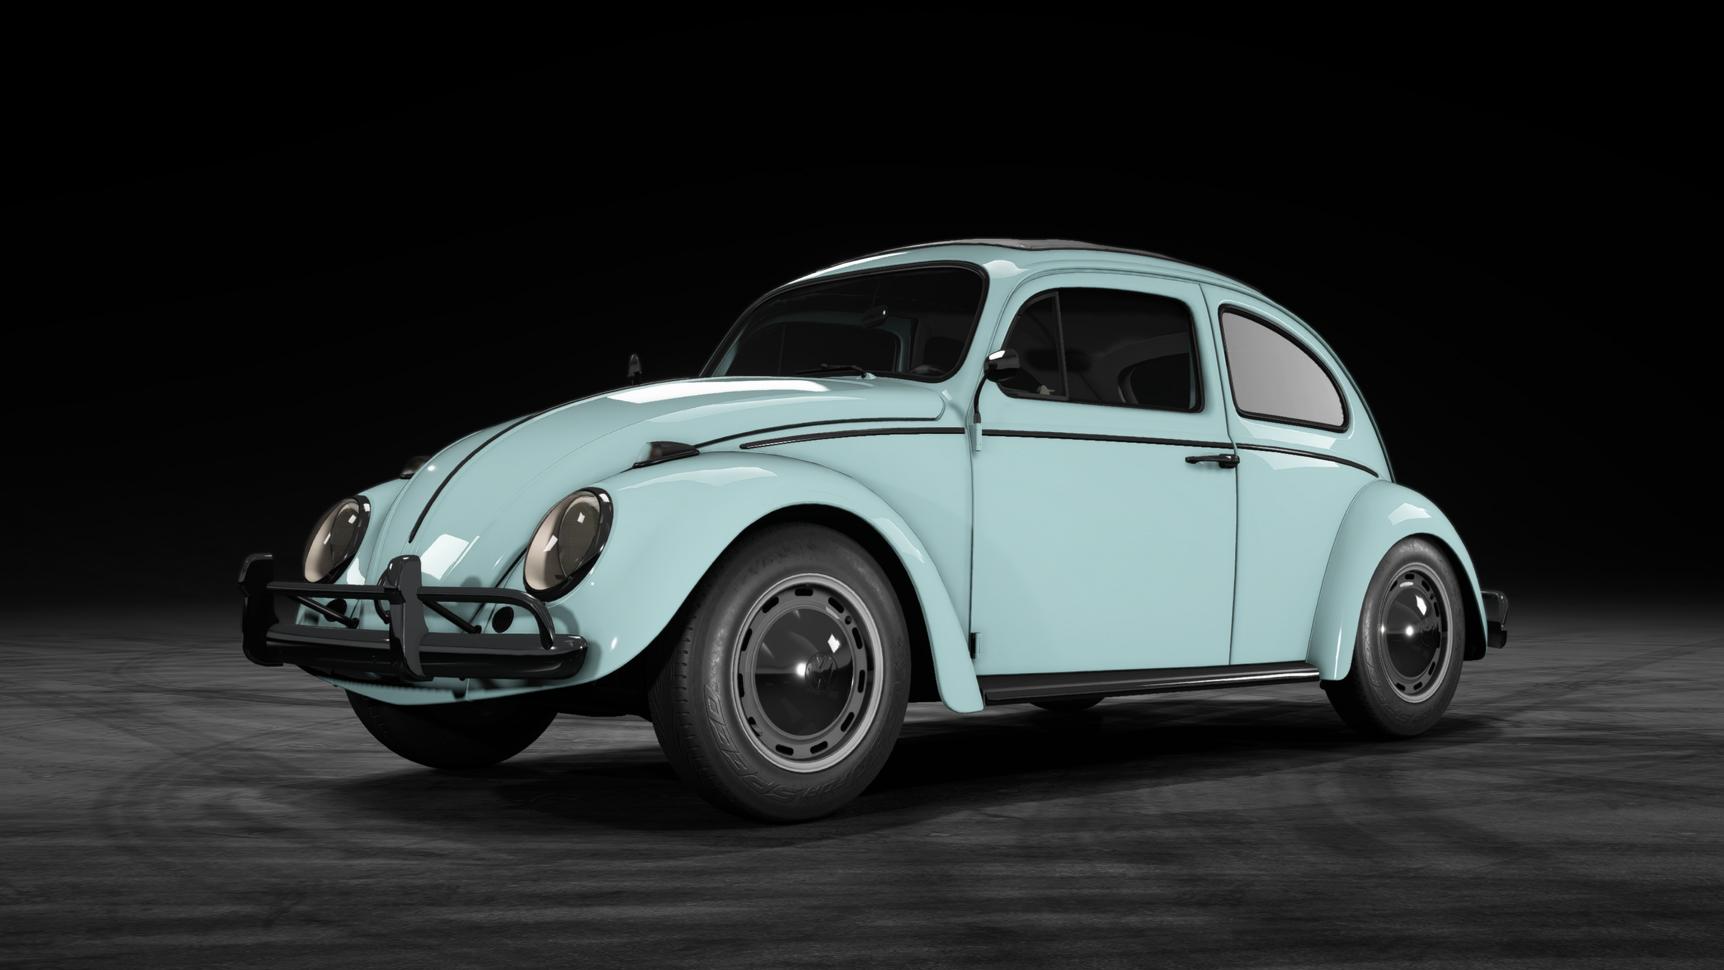 Volkswagen Beetle | Need for Speed Wiki | Fandom